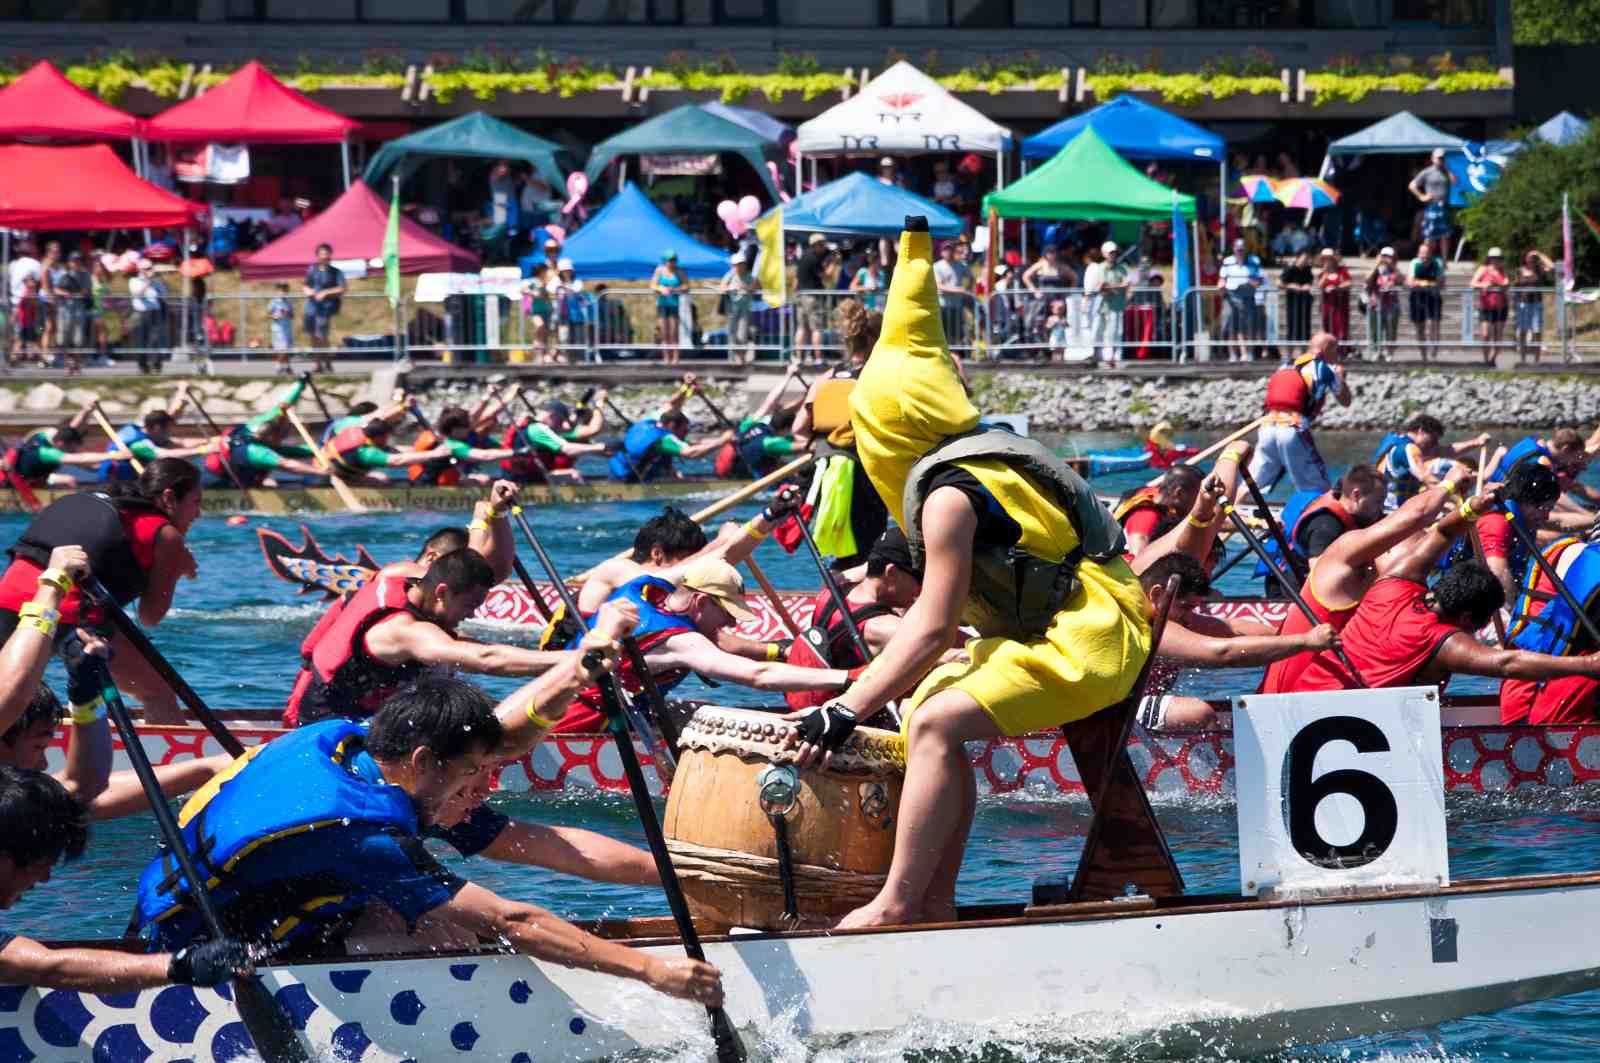 Quebec Cup dragon boat racing